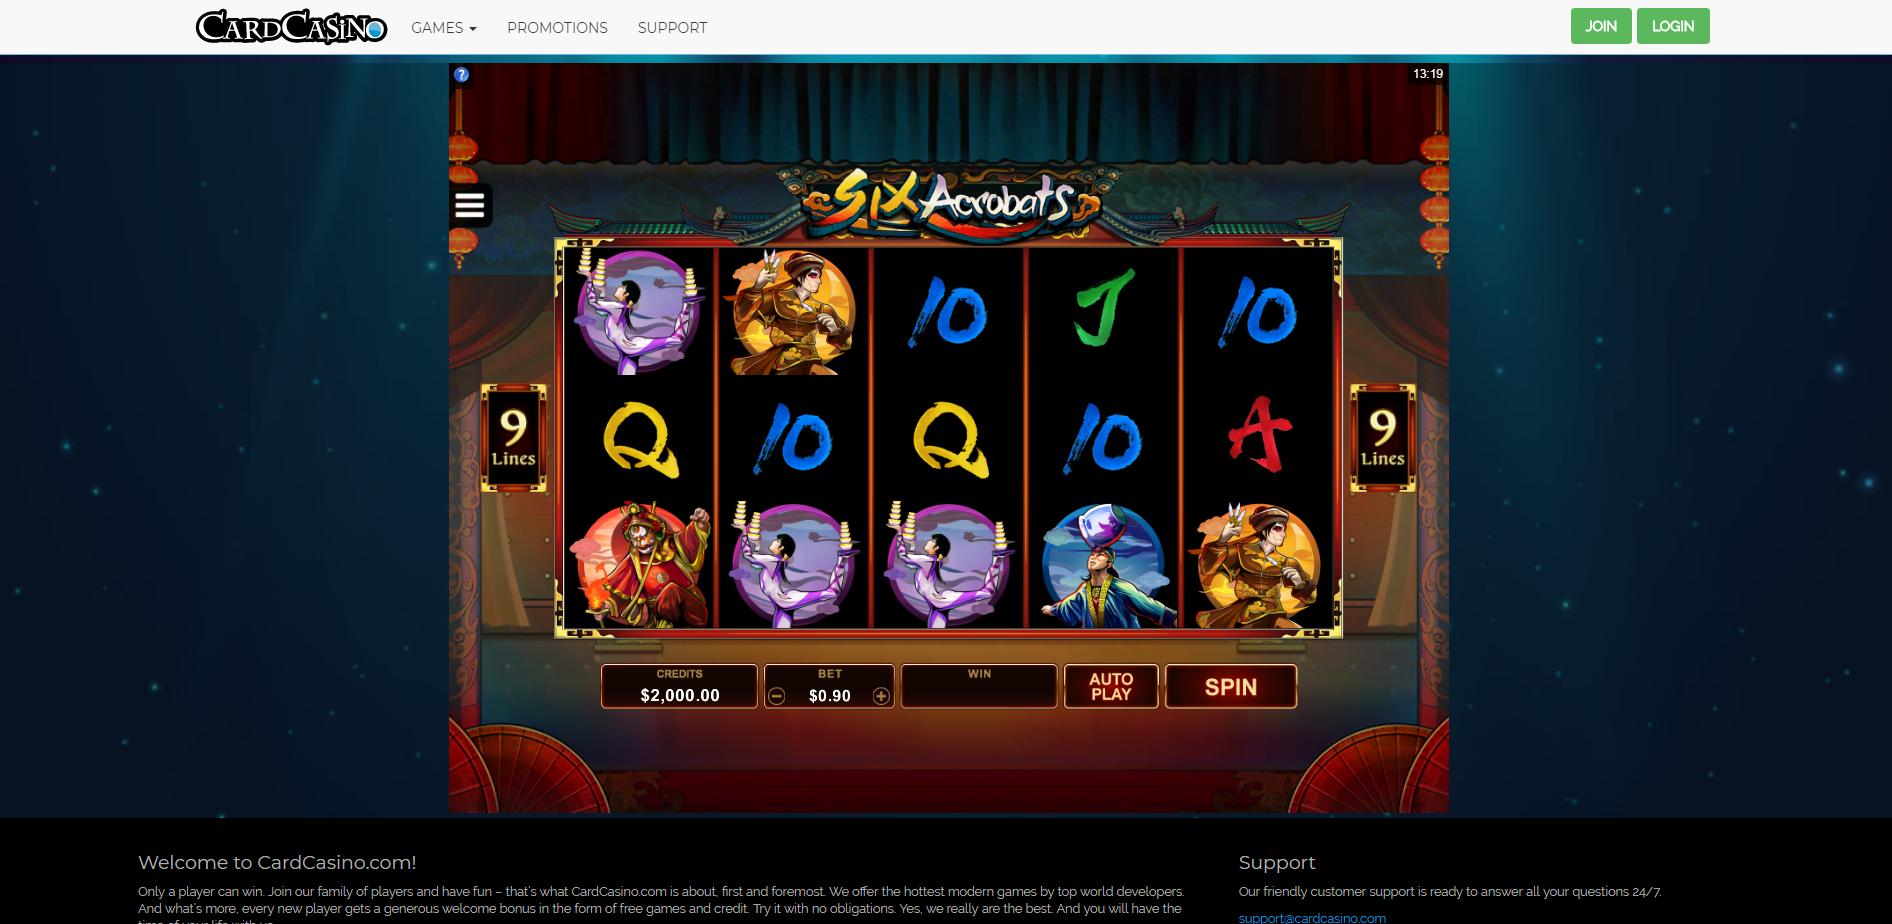 CardCasino-online-games